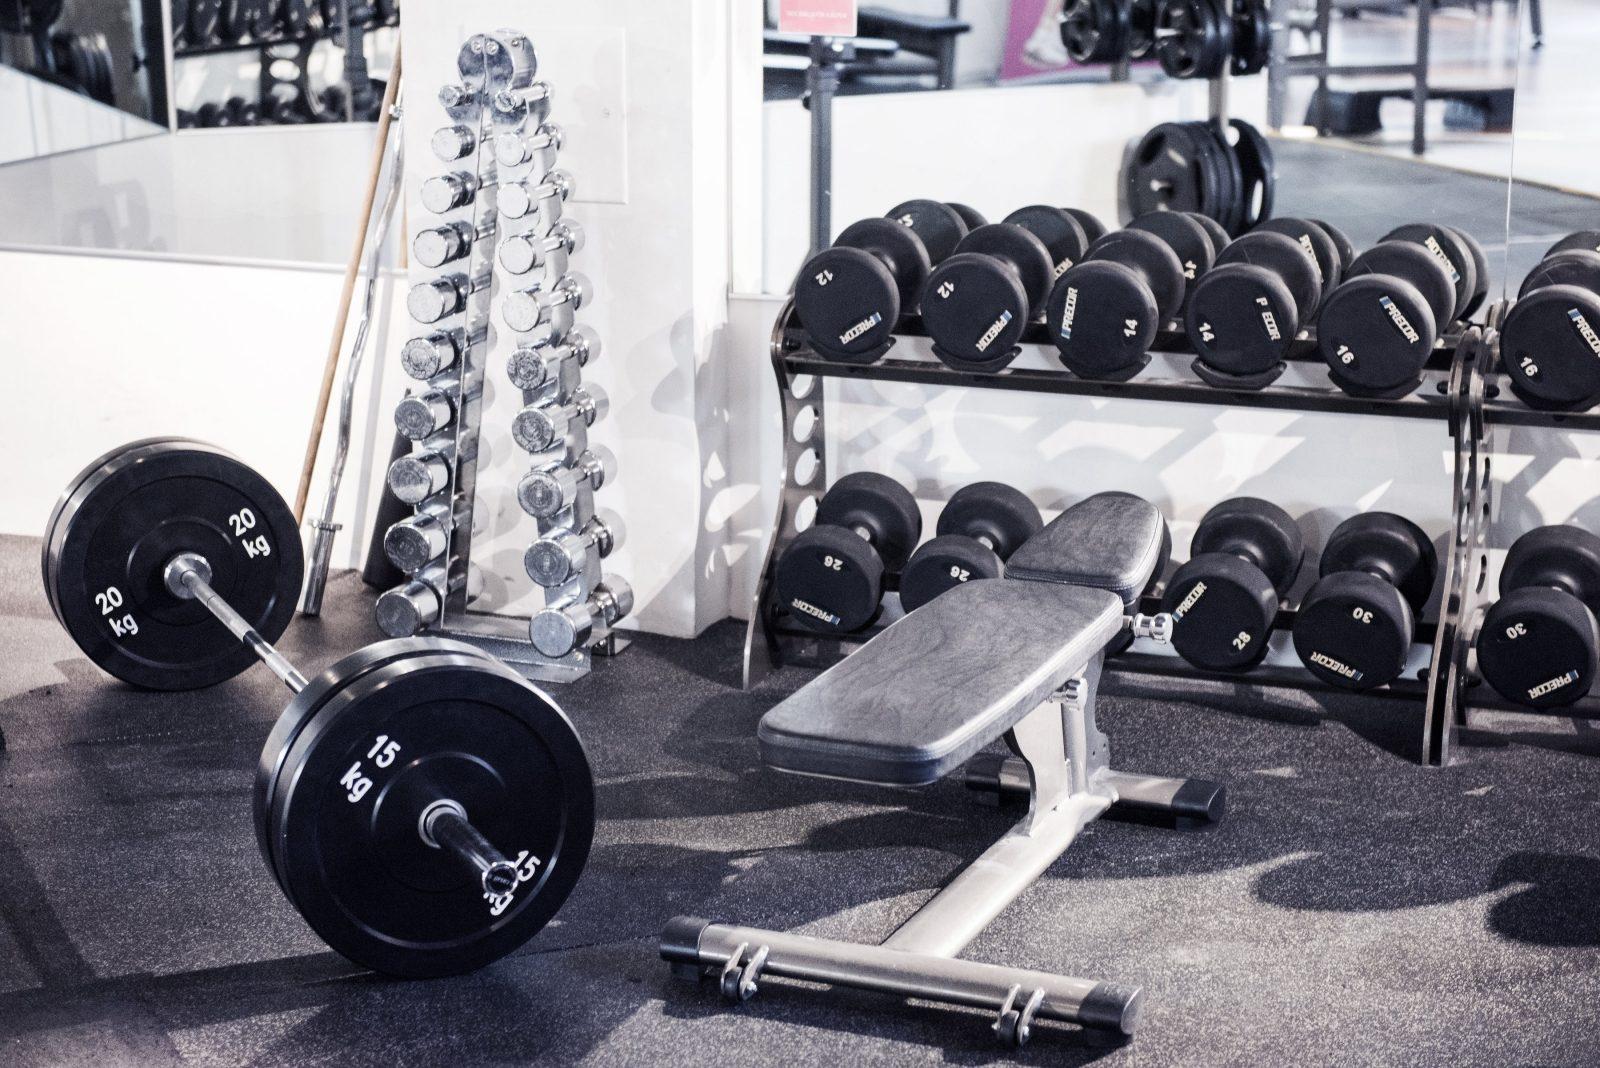 provträna gym stockholm